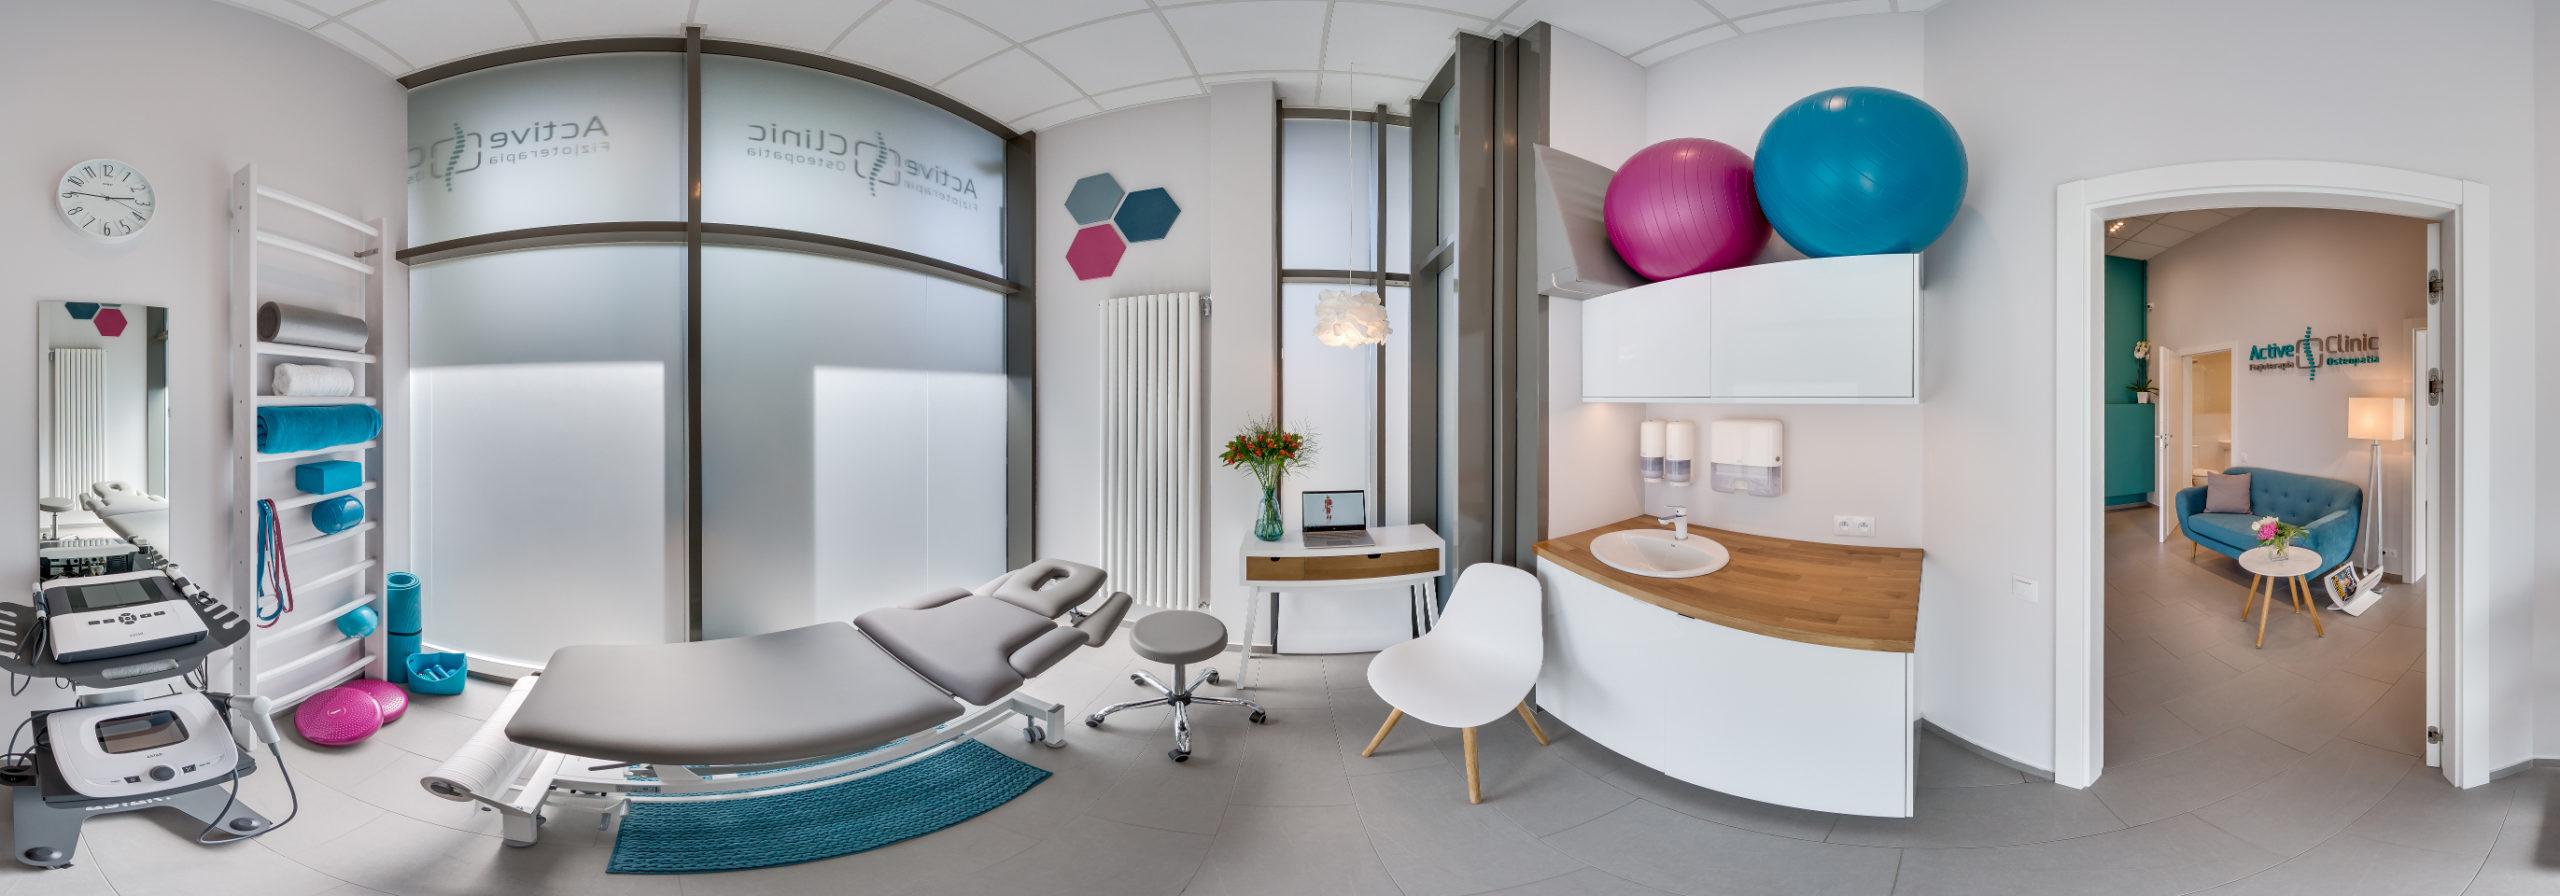 Active Clinic - Gabinet 1 Rehabilitacja Fizjoterapia